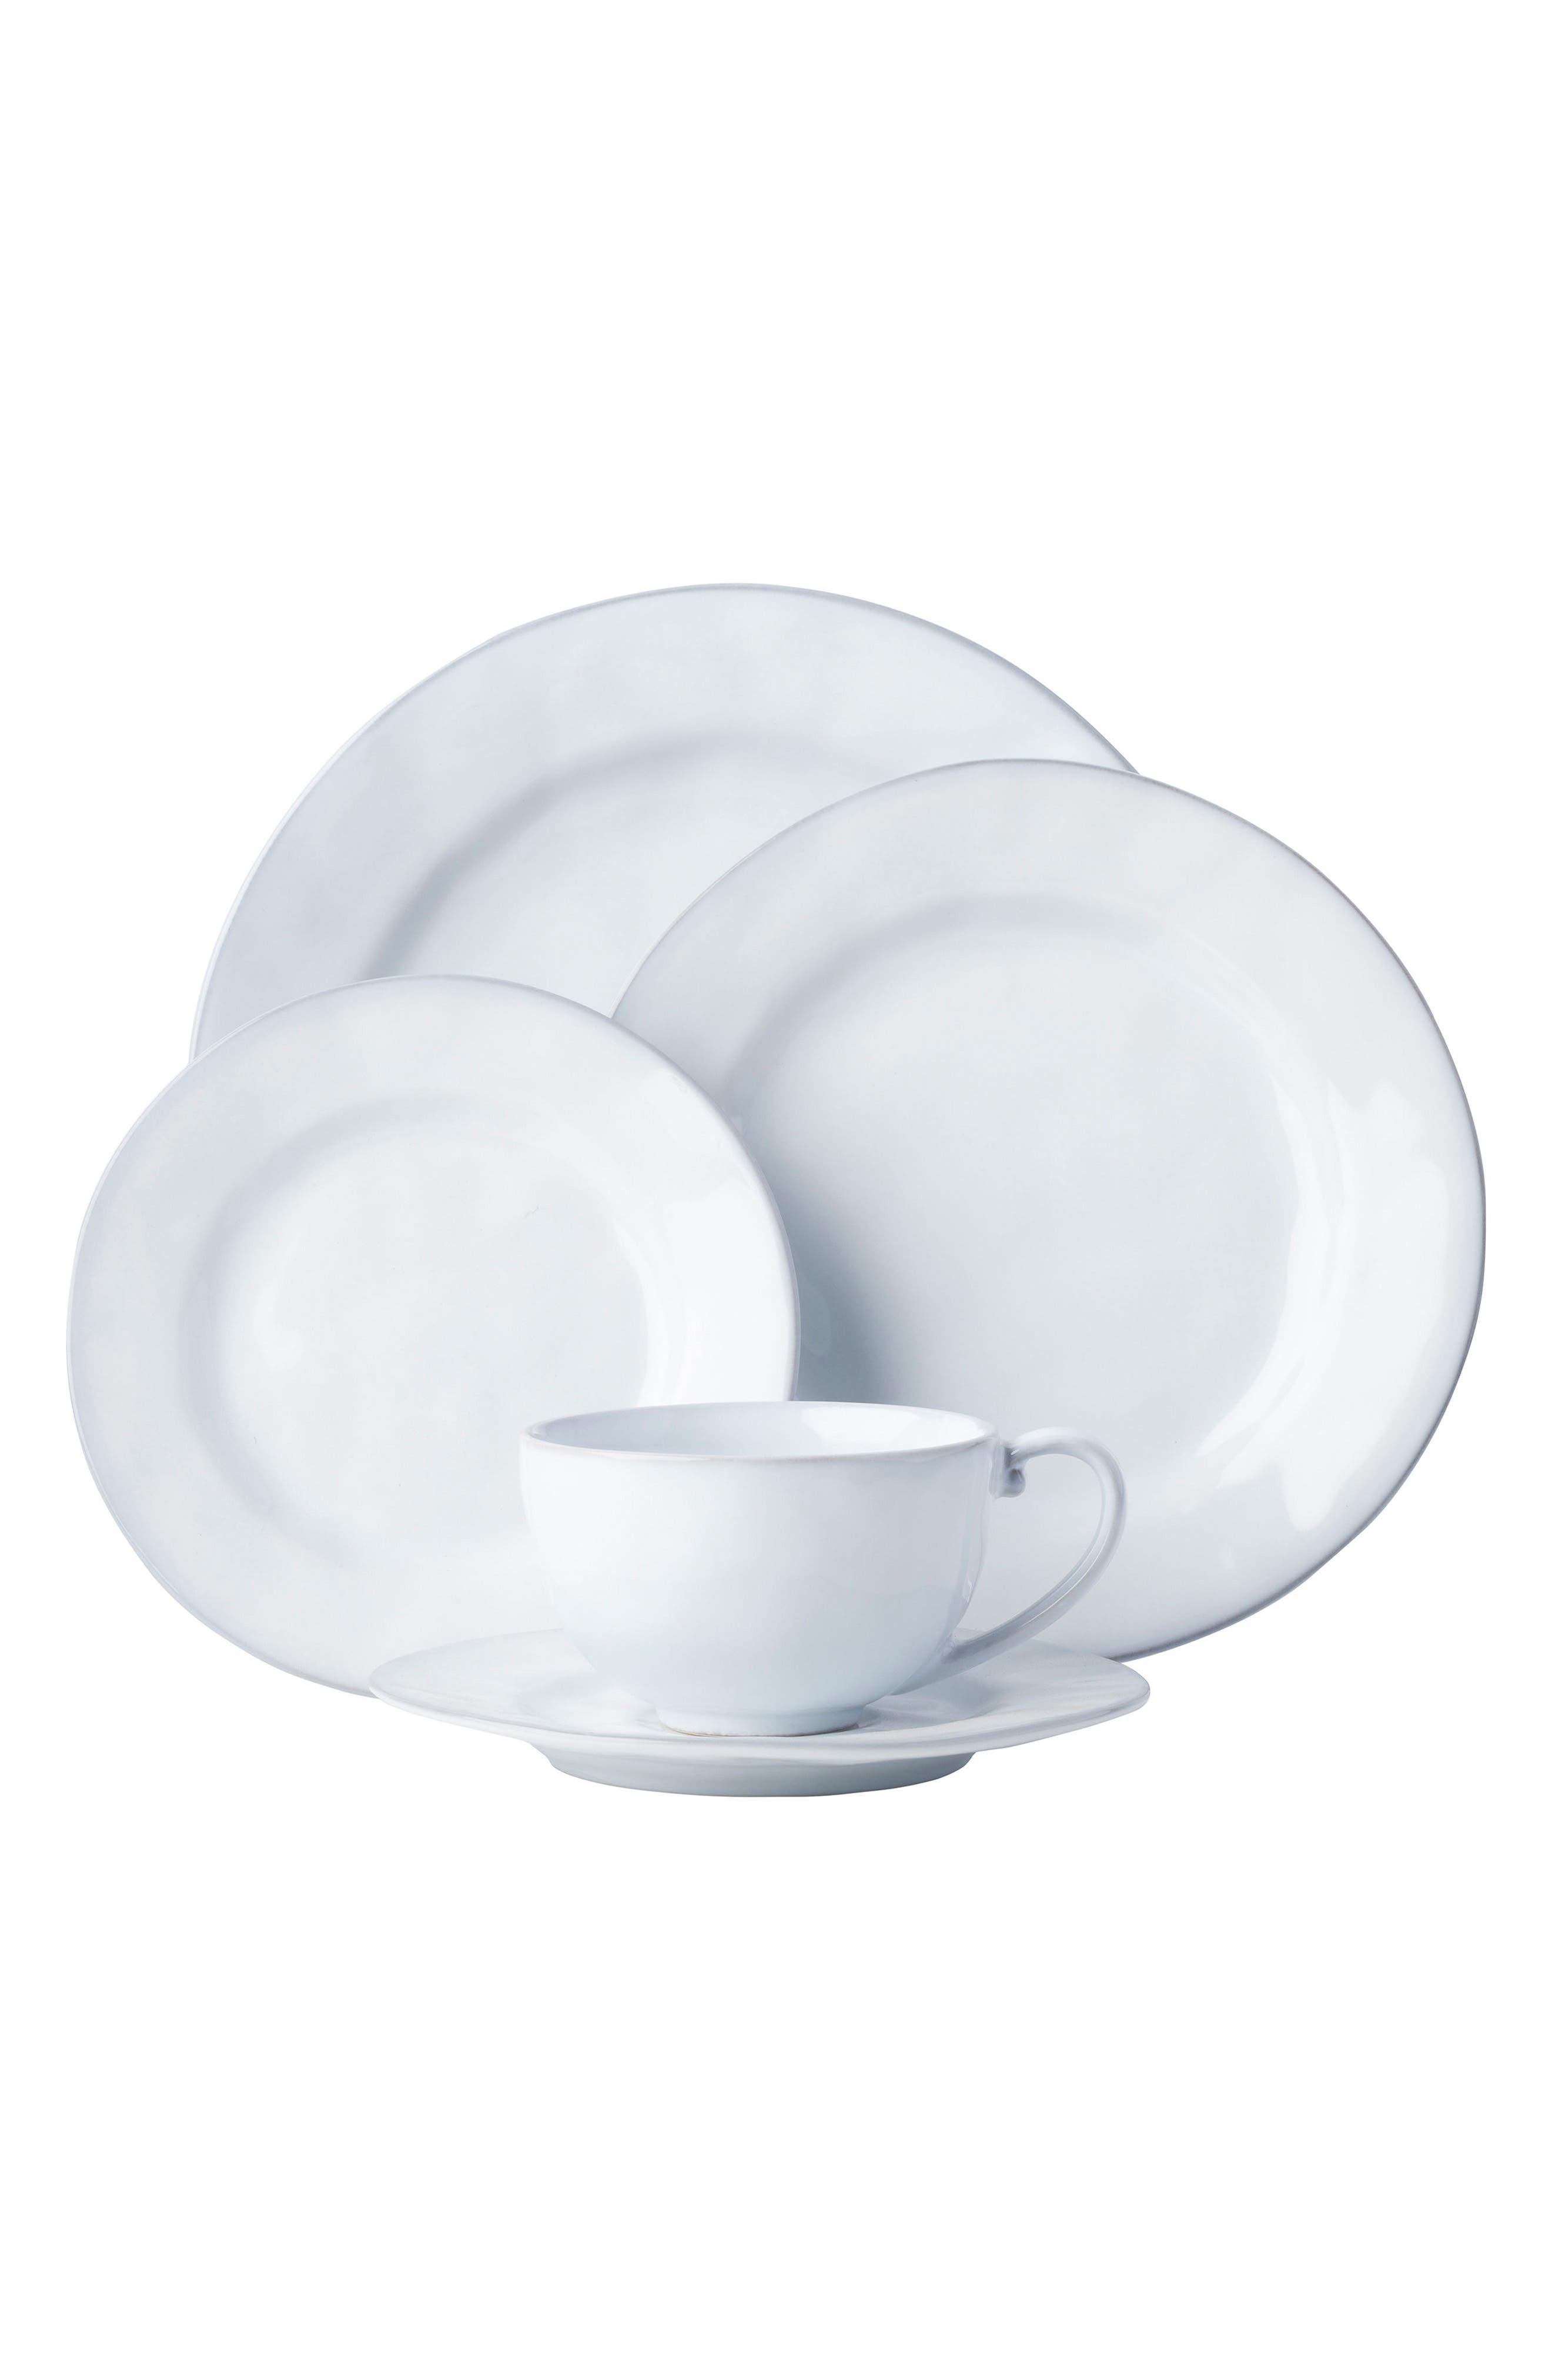 Quotidien 5-Piece Ceramic Place Setting,                             Main thumbnail 1, color,                             White Truffle